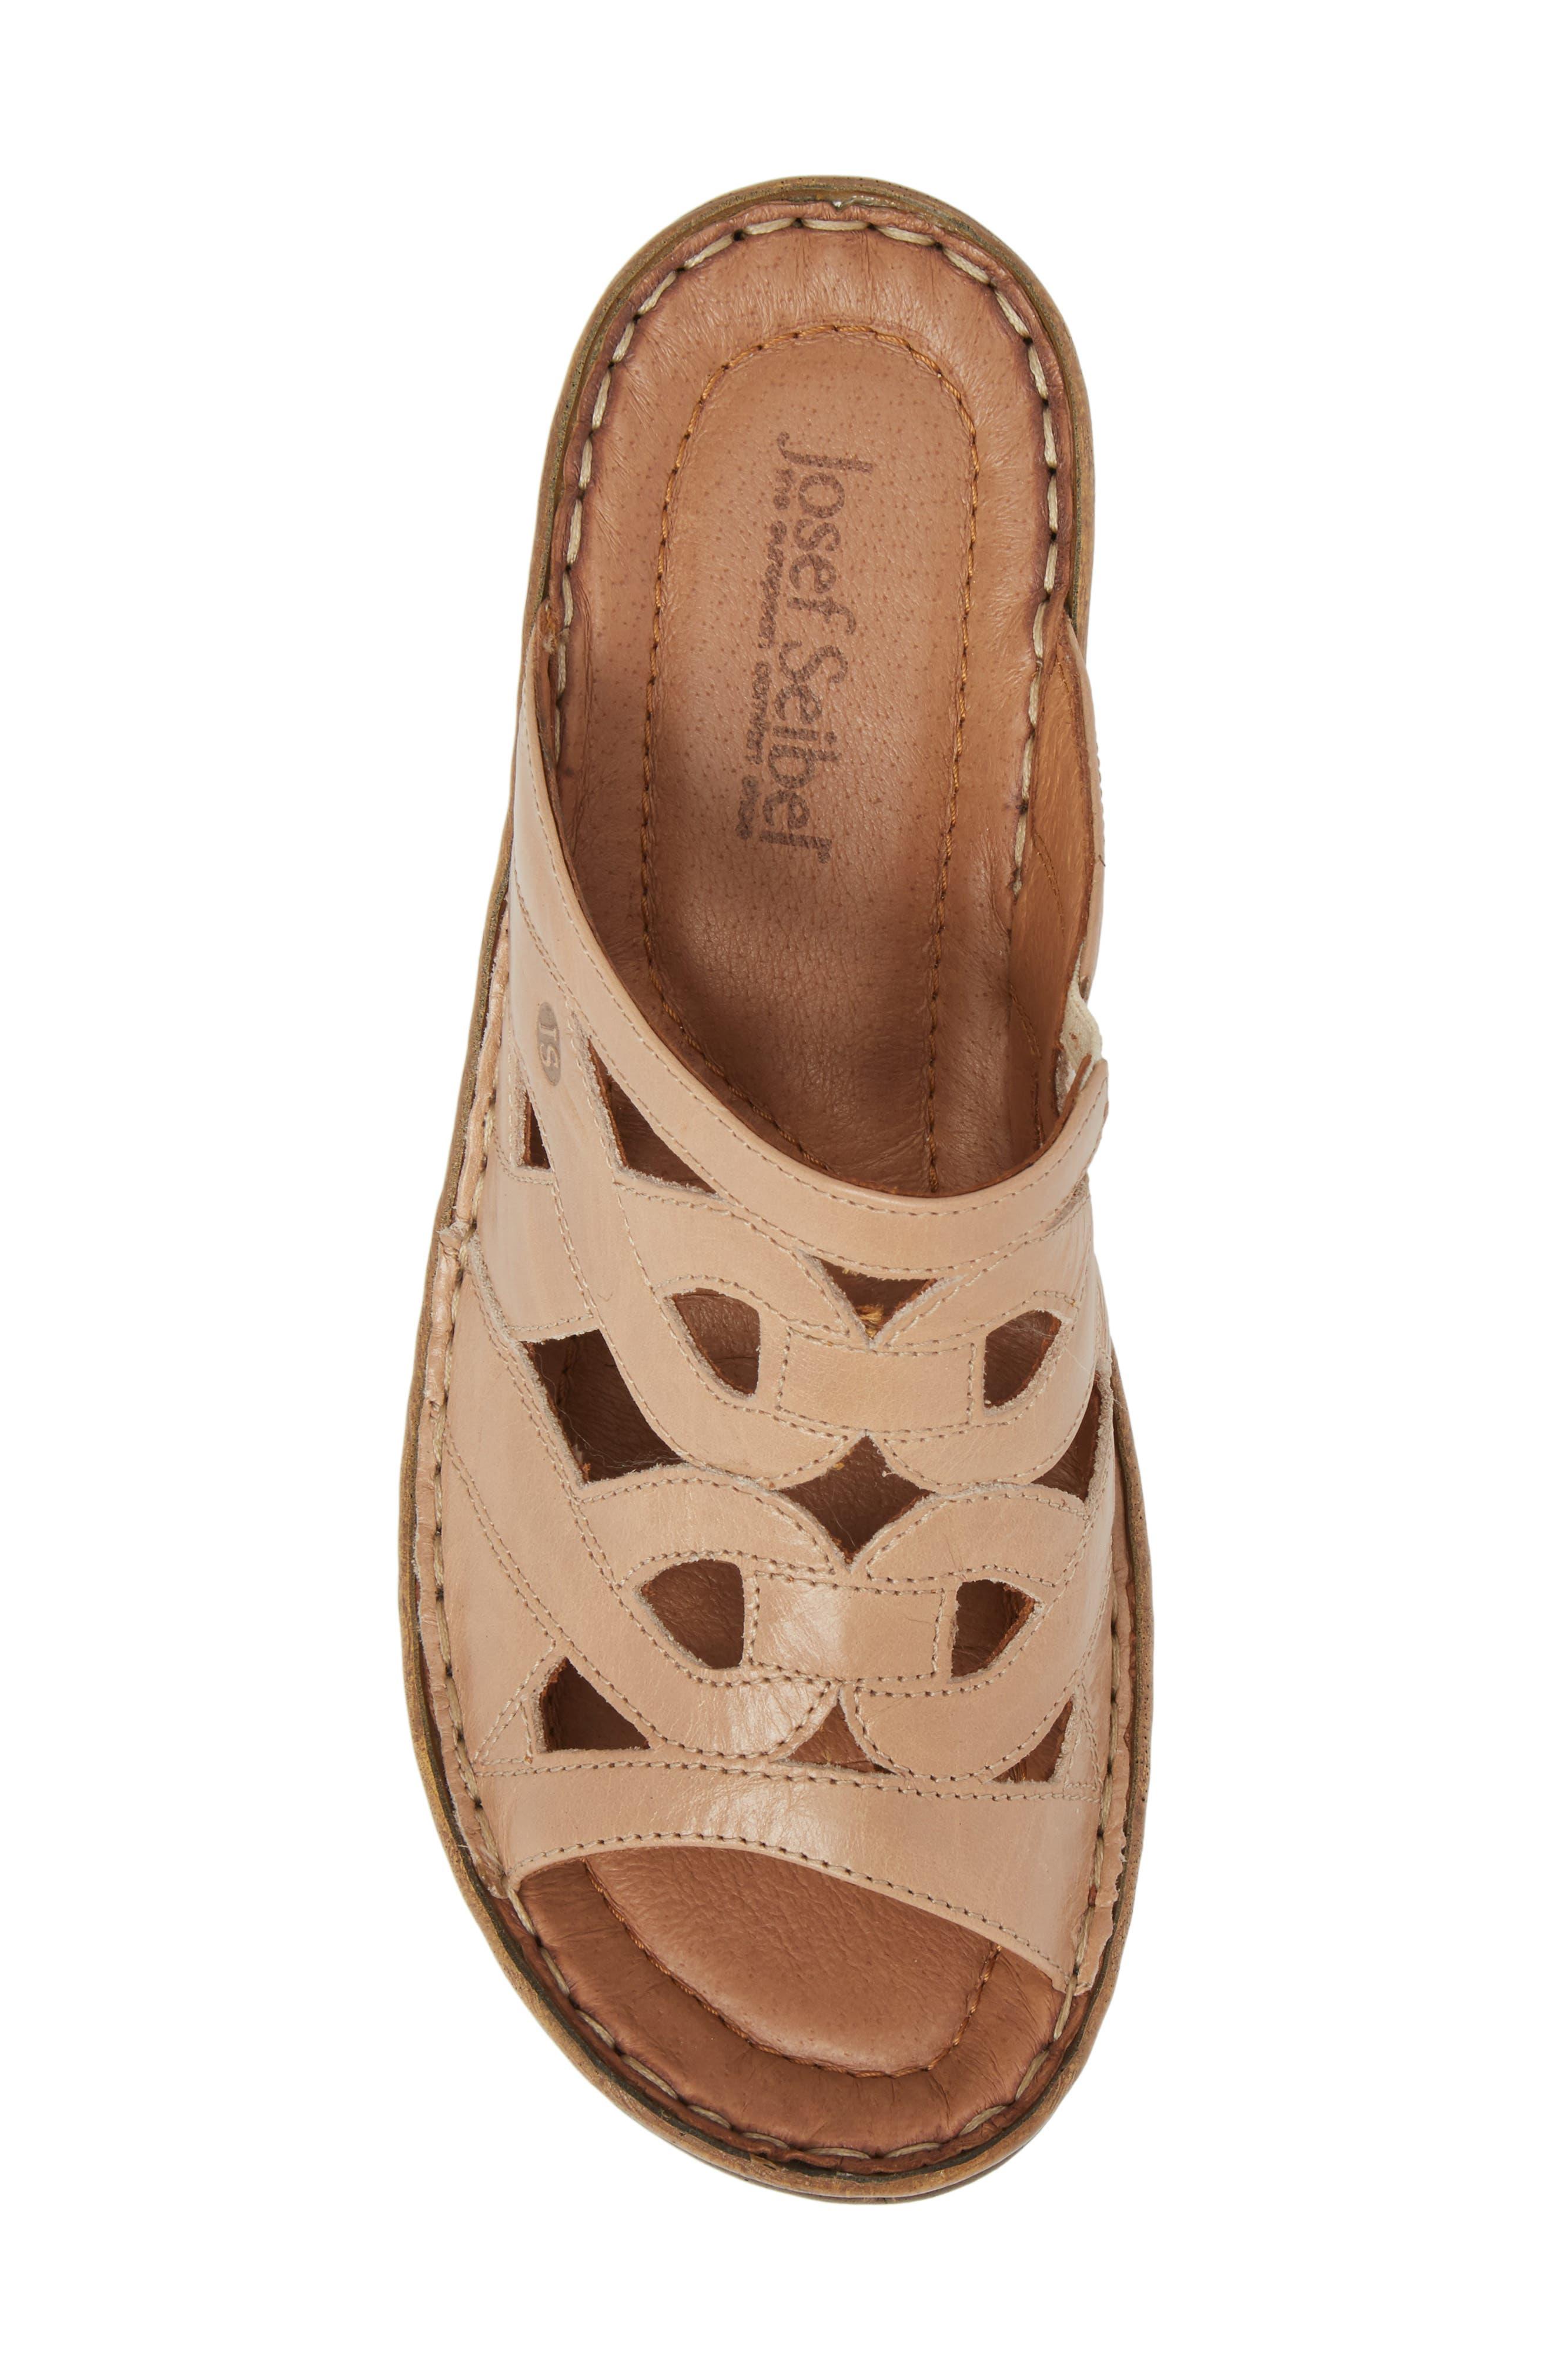 Catalonia 44 Slide Sandal,                             Alternate thumbnail 5, color,                             Beige Leather